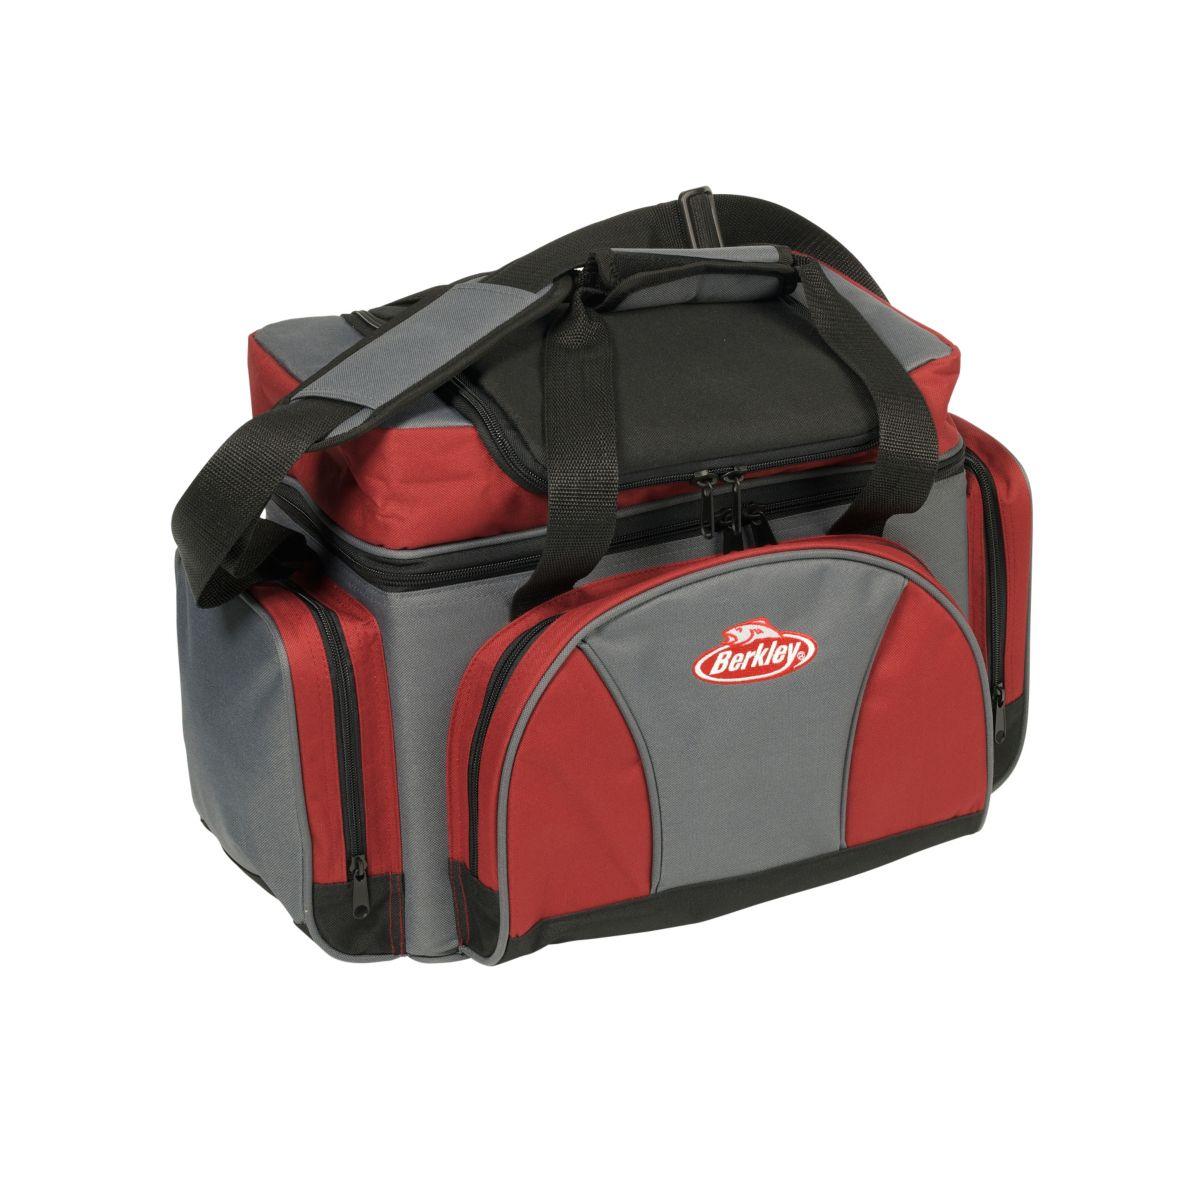 BERKLEY Přívlačová taška s krabičkami Berkley System Bag Grey Red XL